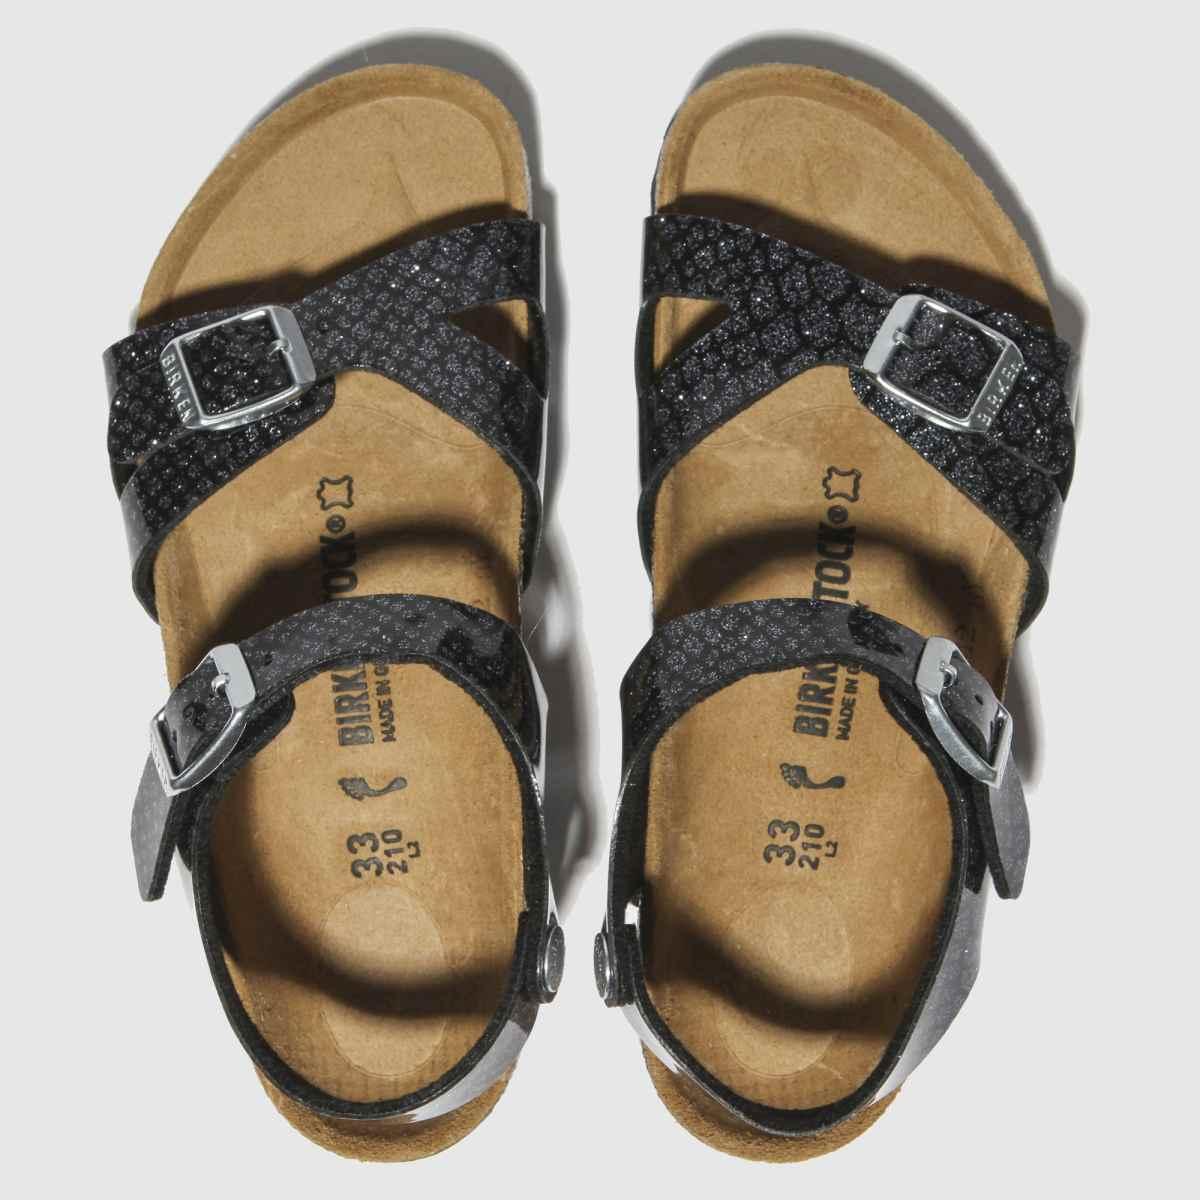 Birkenstock Black Rio Sandals Junior